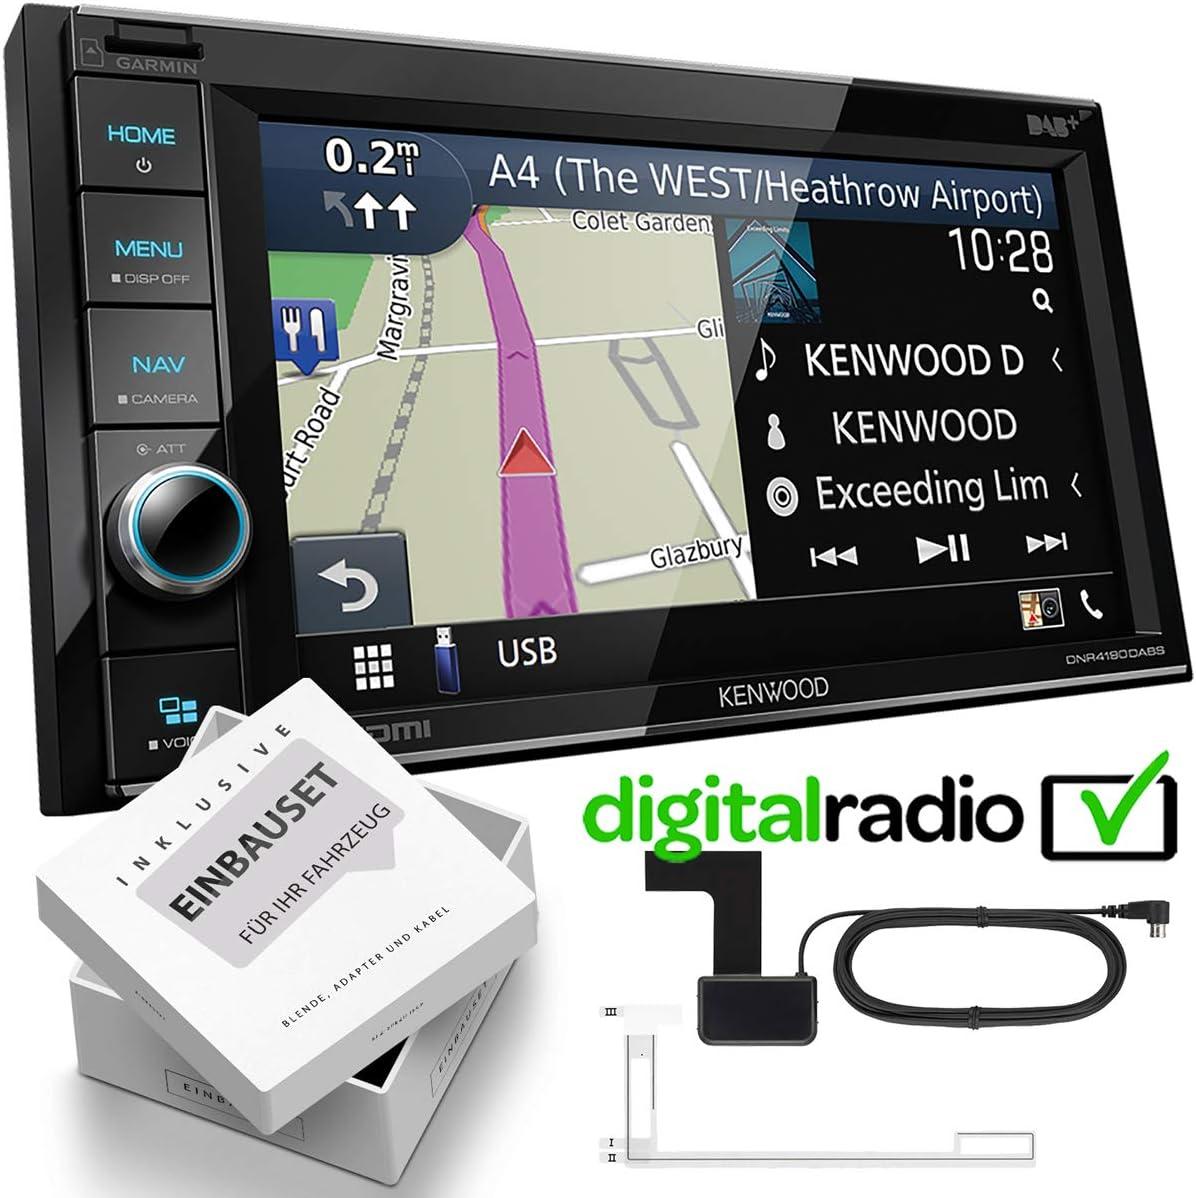 Kenwood Dnr4190dabs 2 Din Dab Navigation Mediaplayer Inkl Antenne Passend Für Iveco Daily Vi Ab 2014 Schwarz Navigation